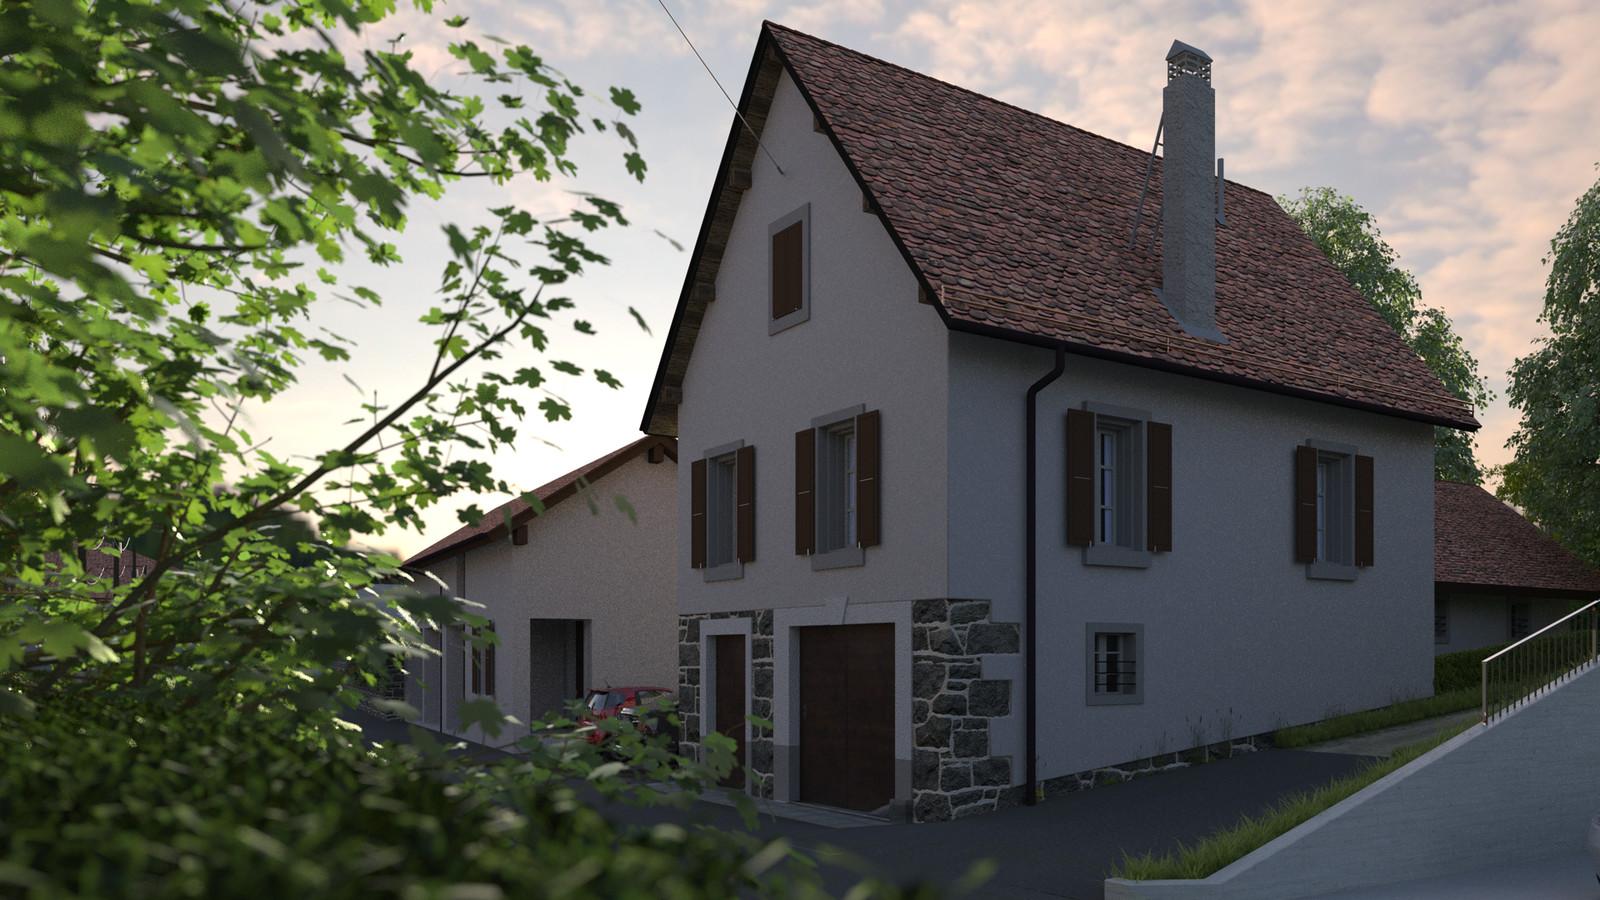 SketchUp + Thea Render  Little Swiss House Scene 28 0917 Dawn 01 HD 1920 x 1080 Presto MC